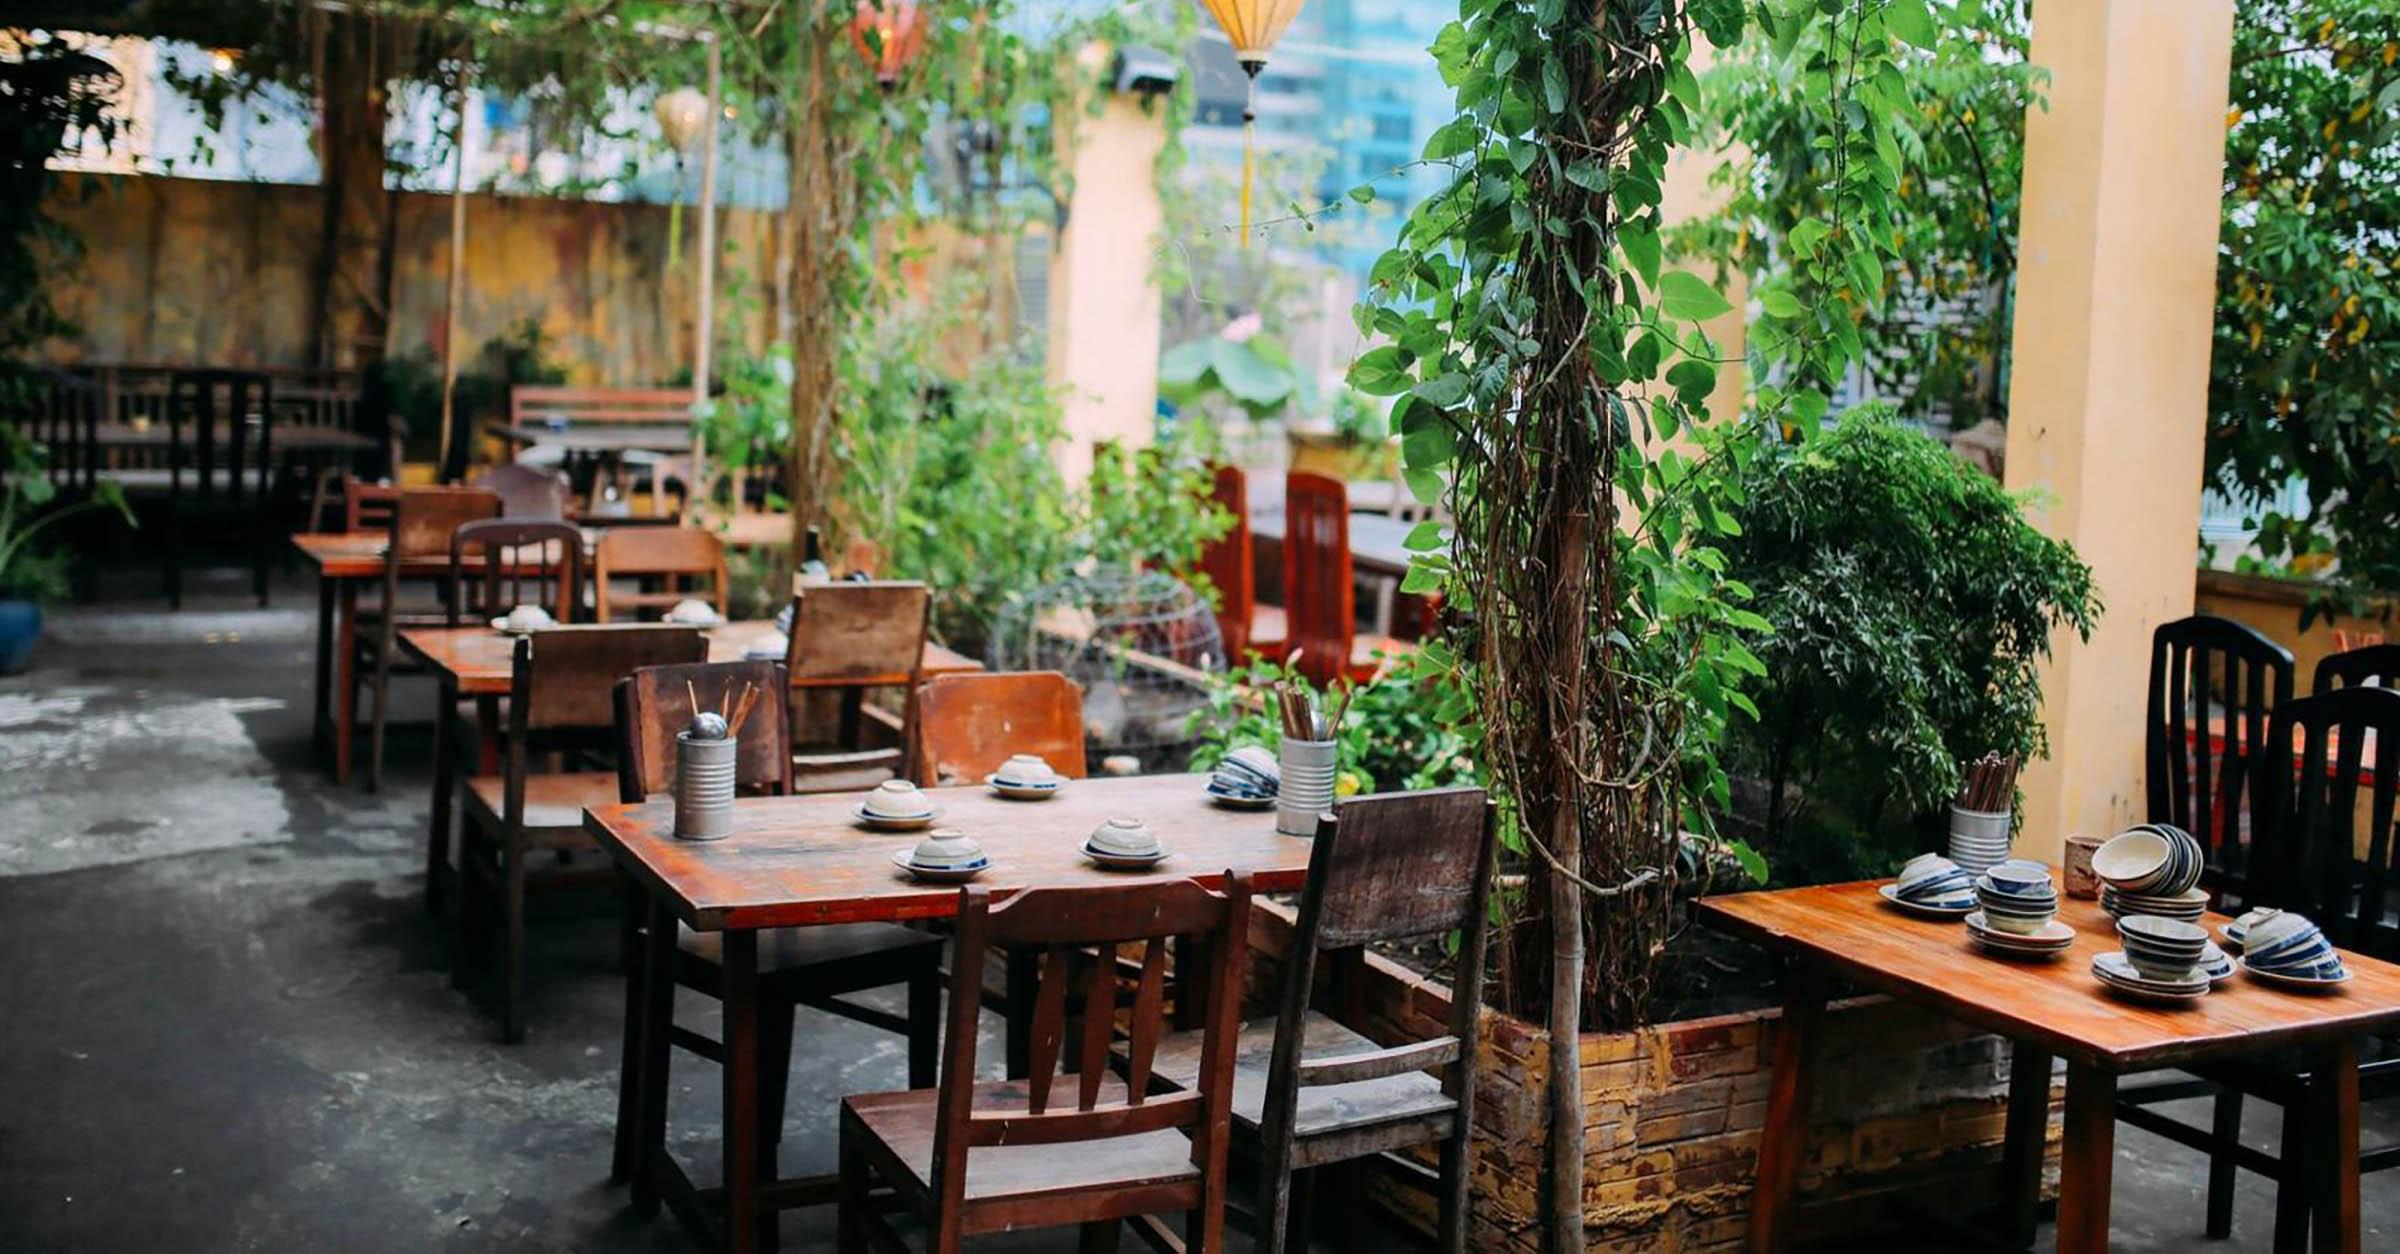 Secret Garden Restaurant - Review